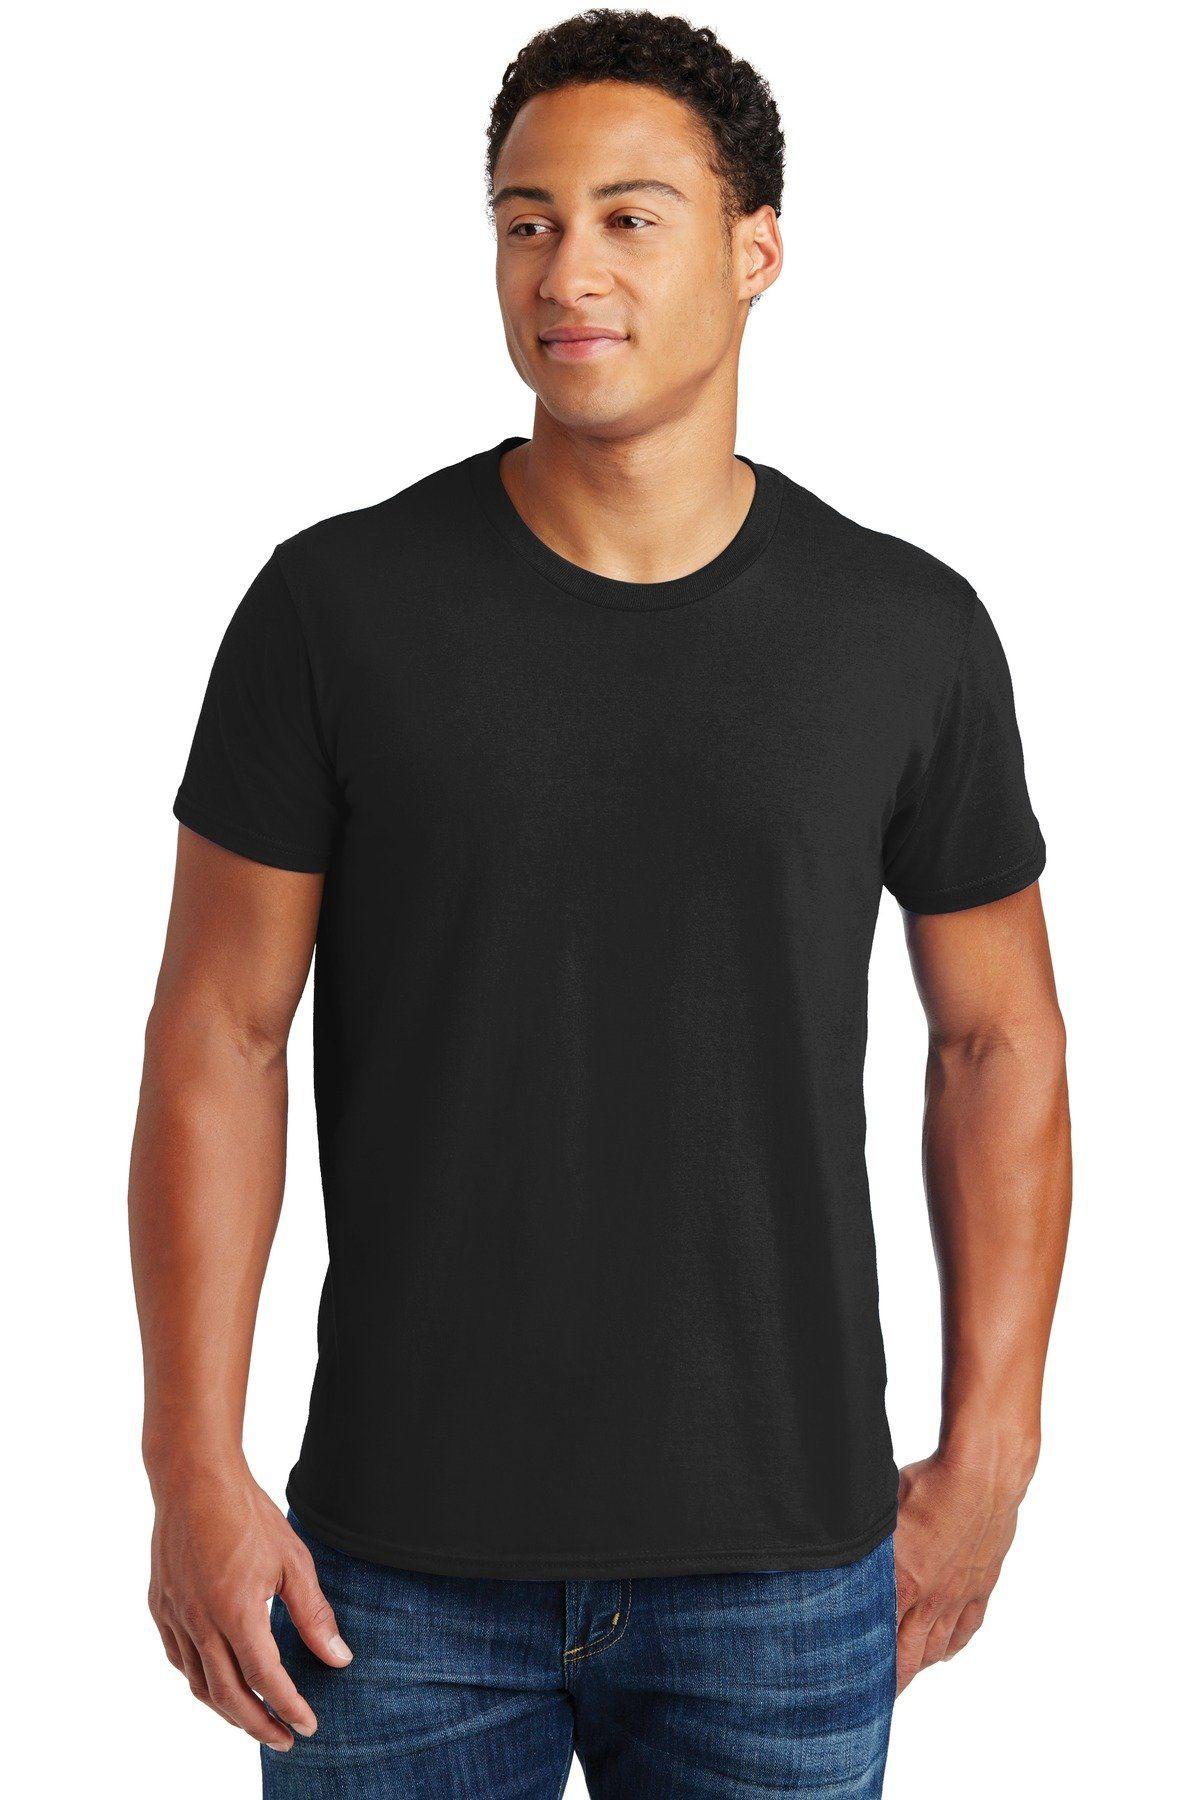 d766dd34fef526 Hanes® - Nano-T® Cotton T-Shirt. 4980